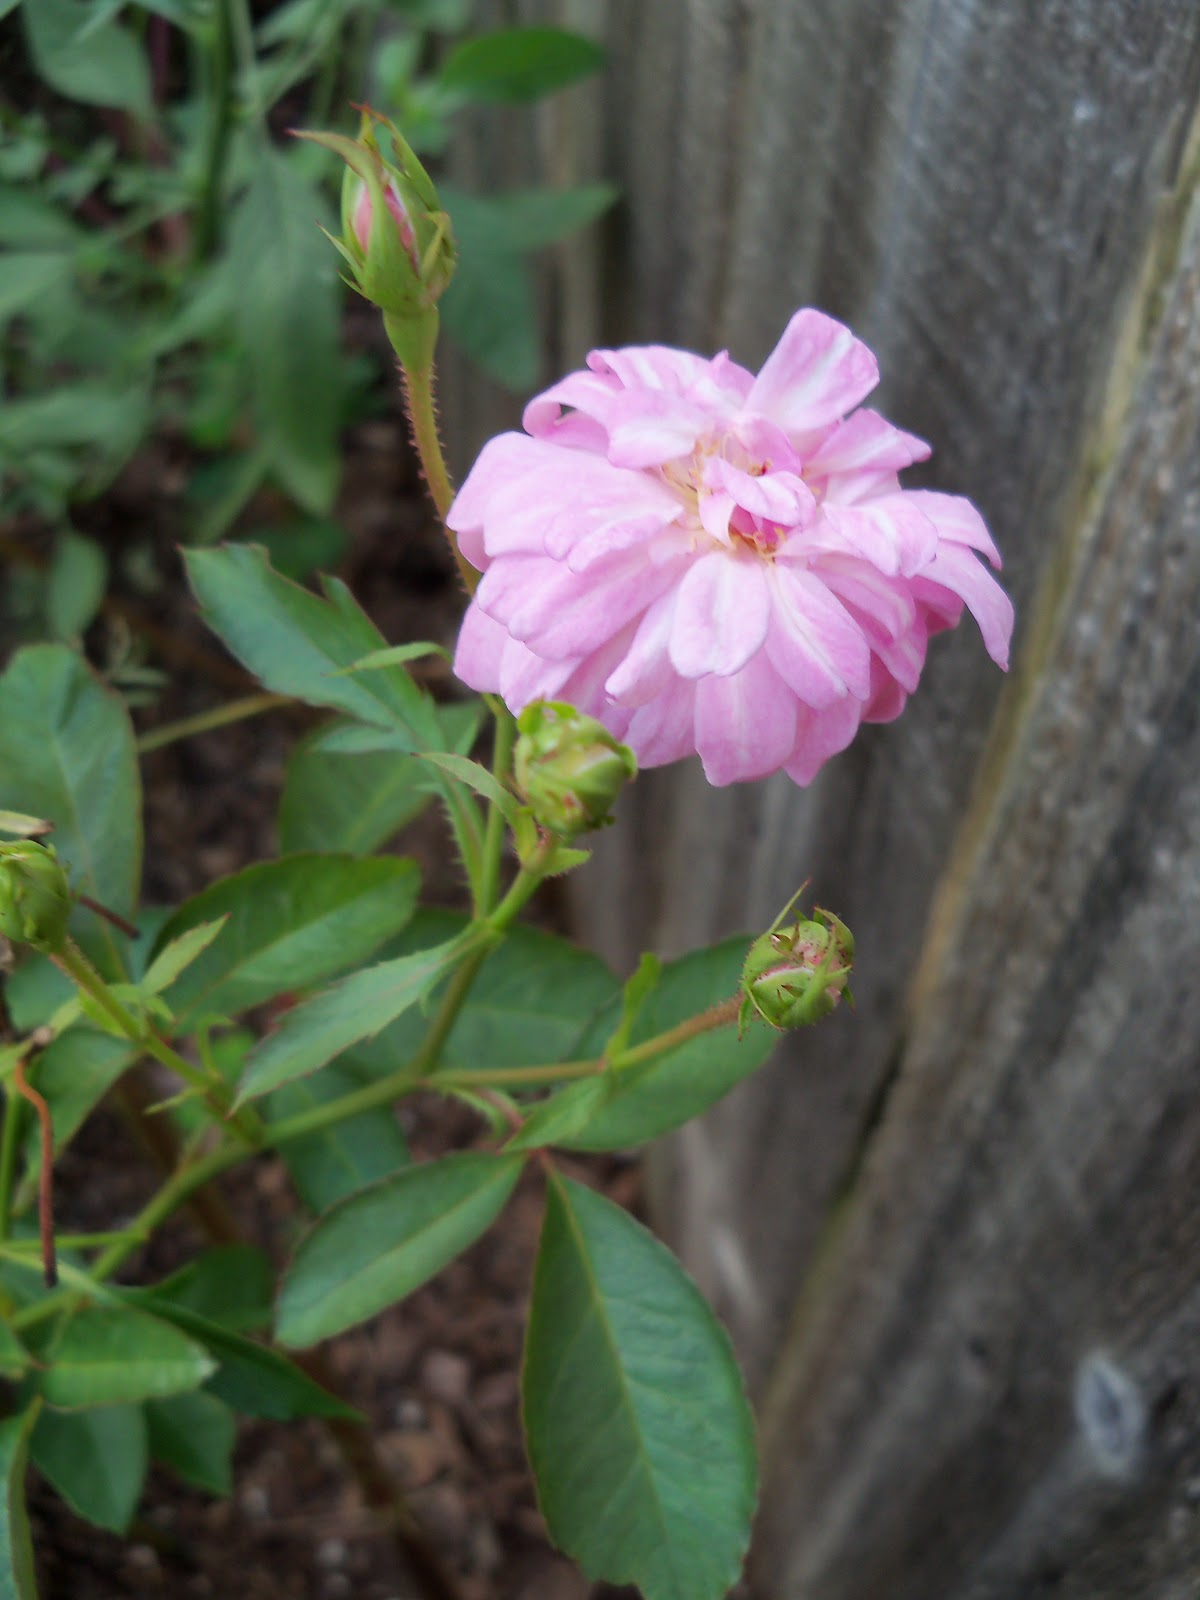 Gardening 2010, Part Three - 101_4992.JPG